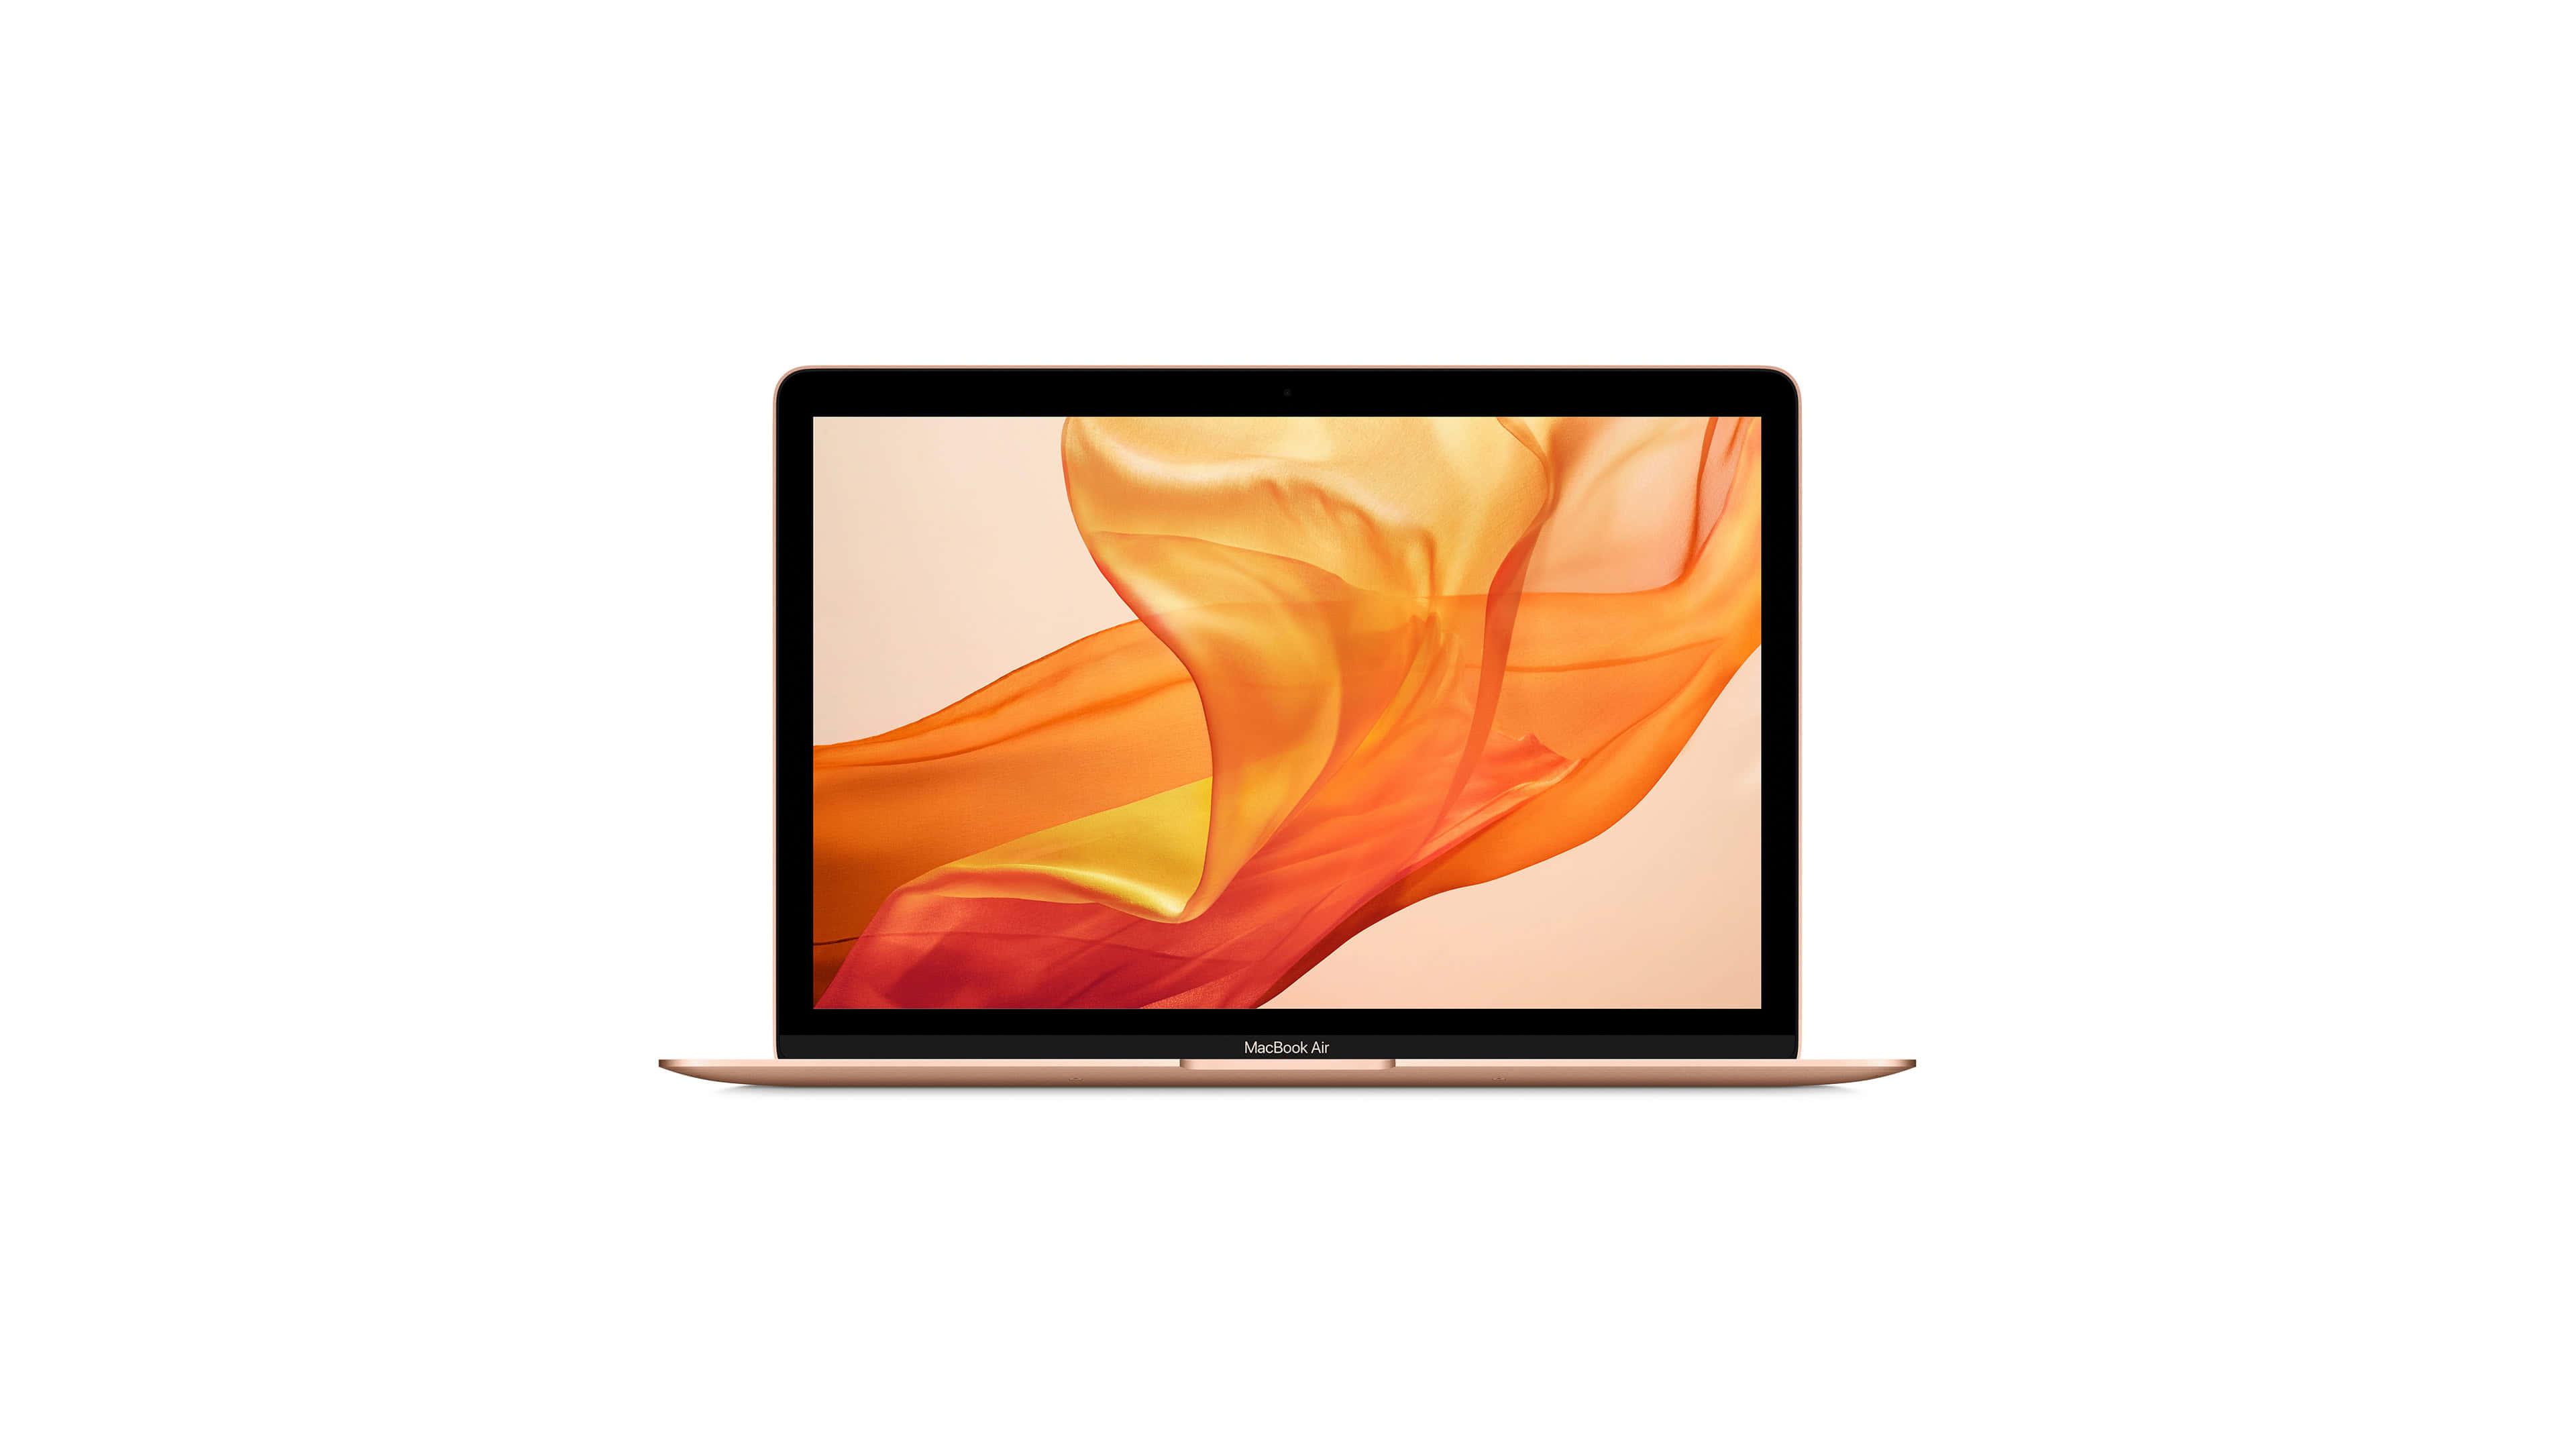 apple macbook air 13.3 front uhd 4k wallpaper